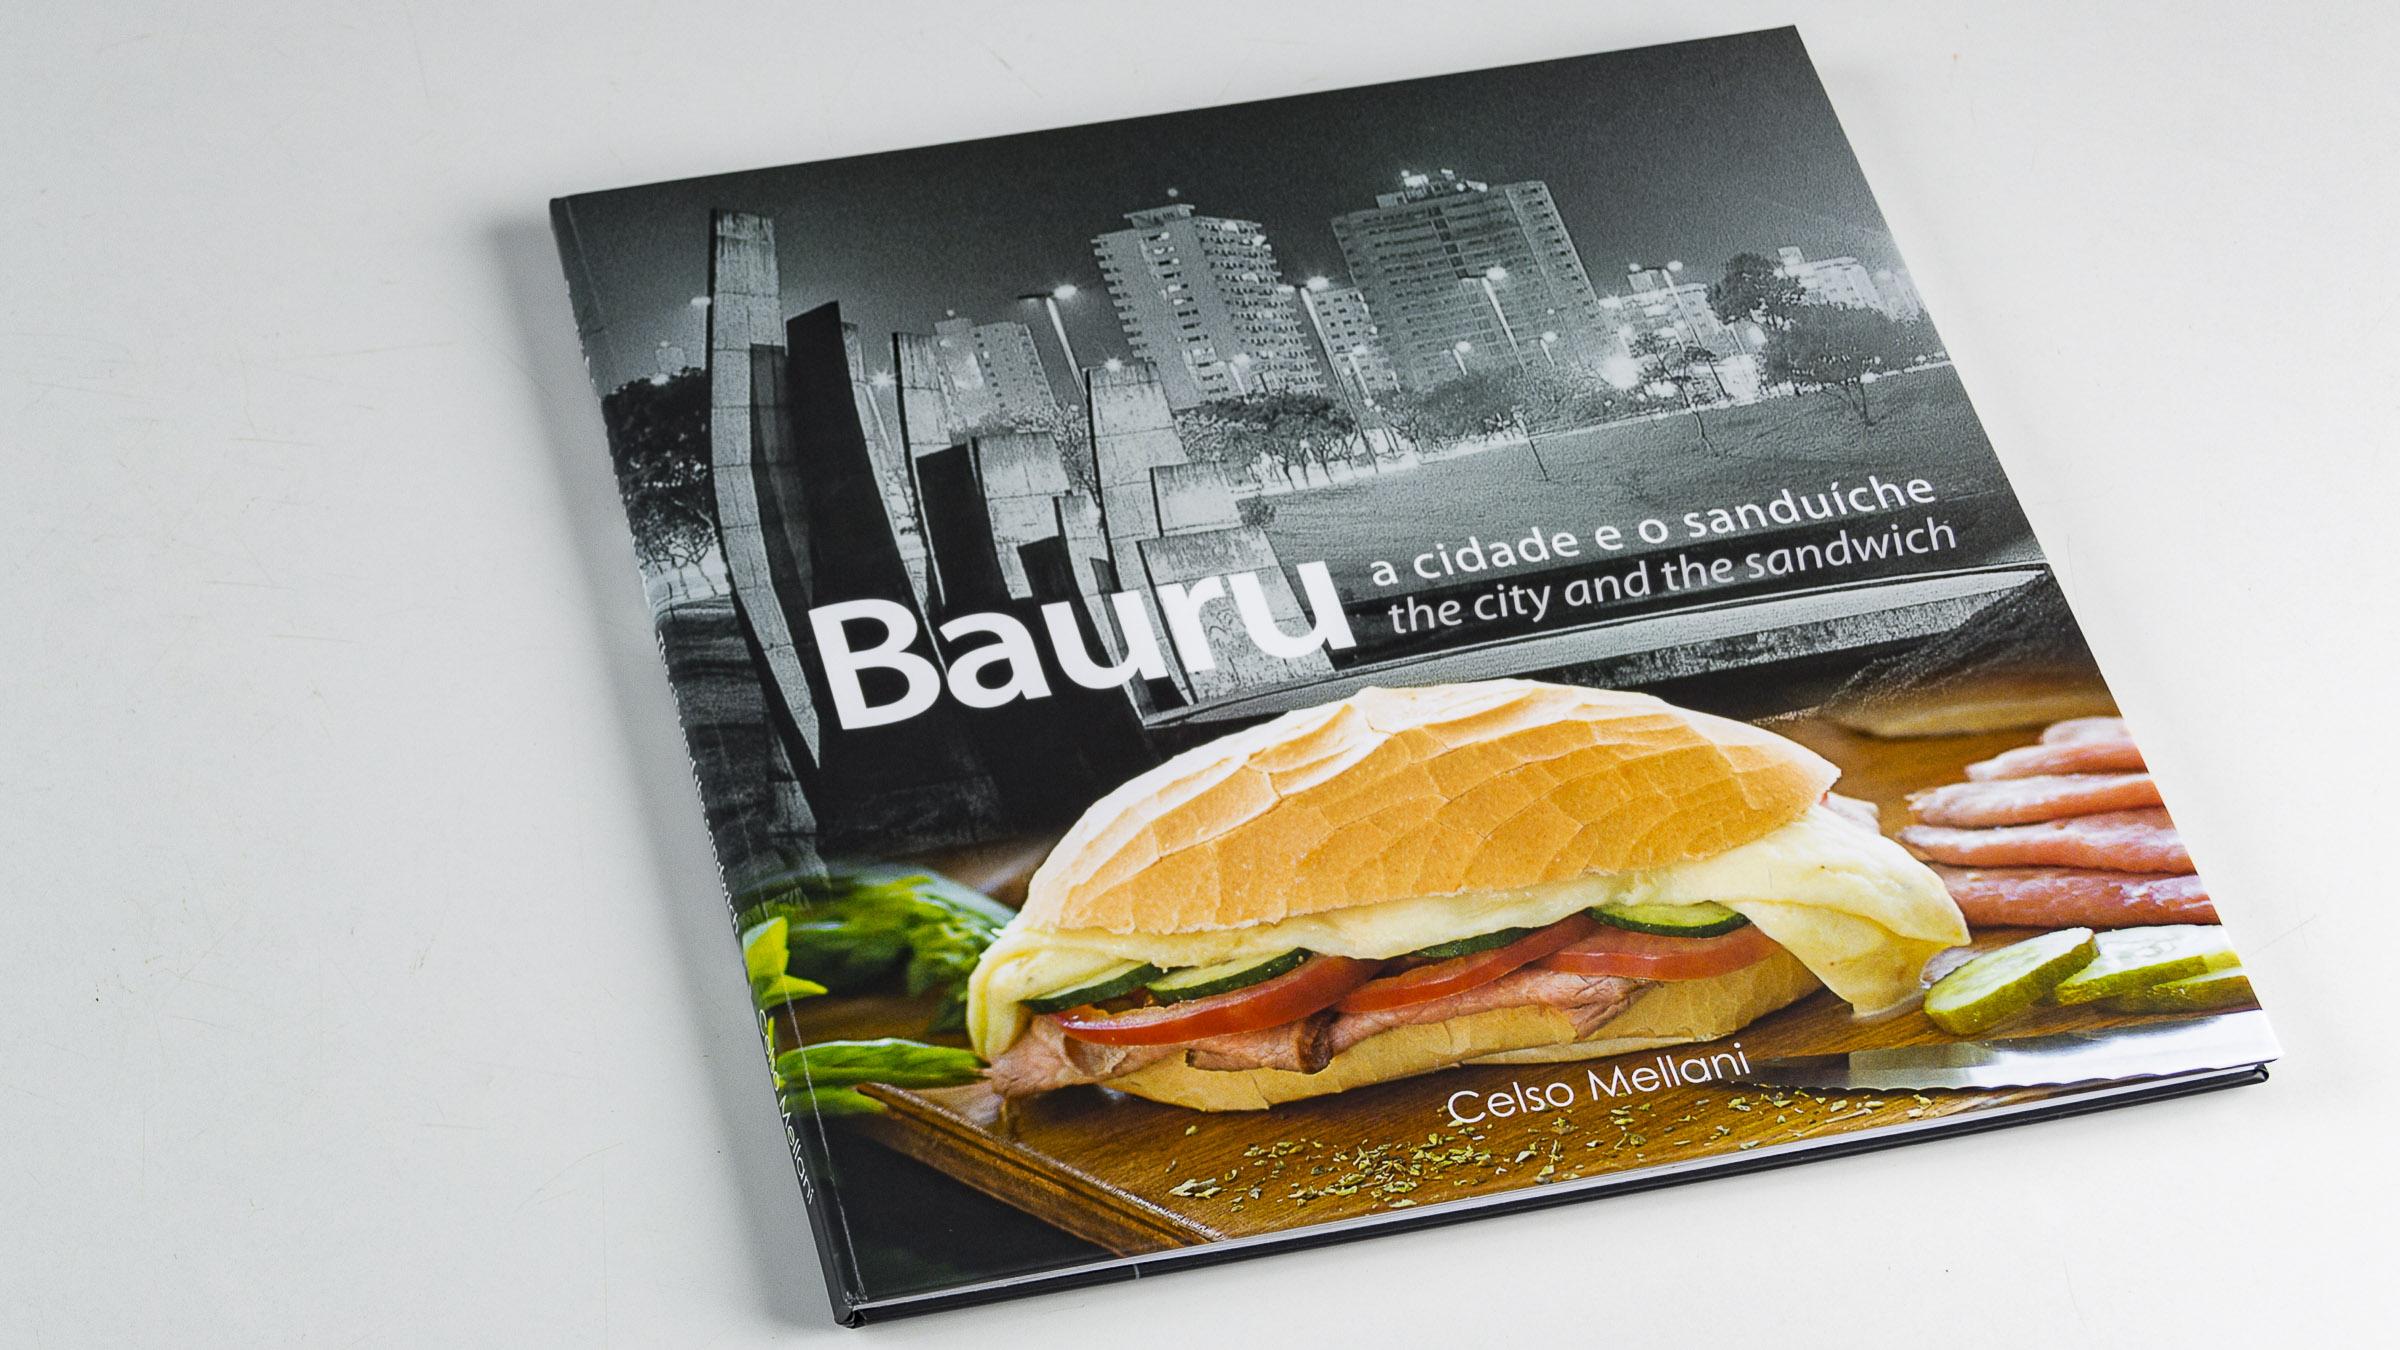 Livro: Bauru a cidade e o sanduíche